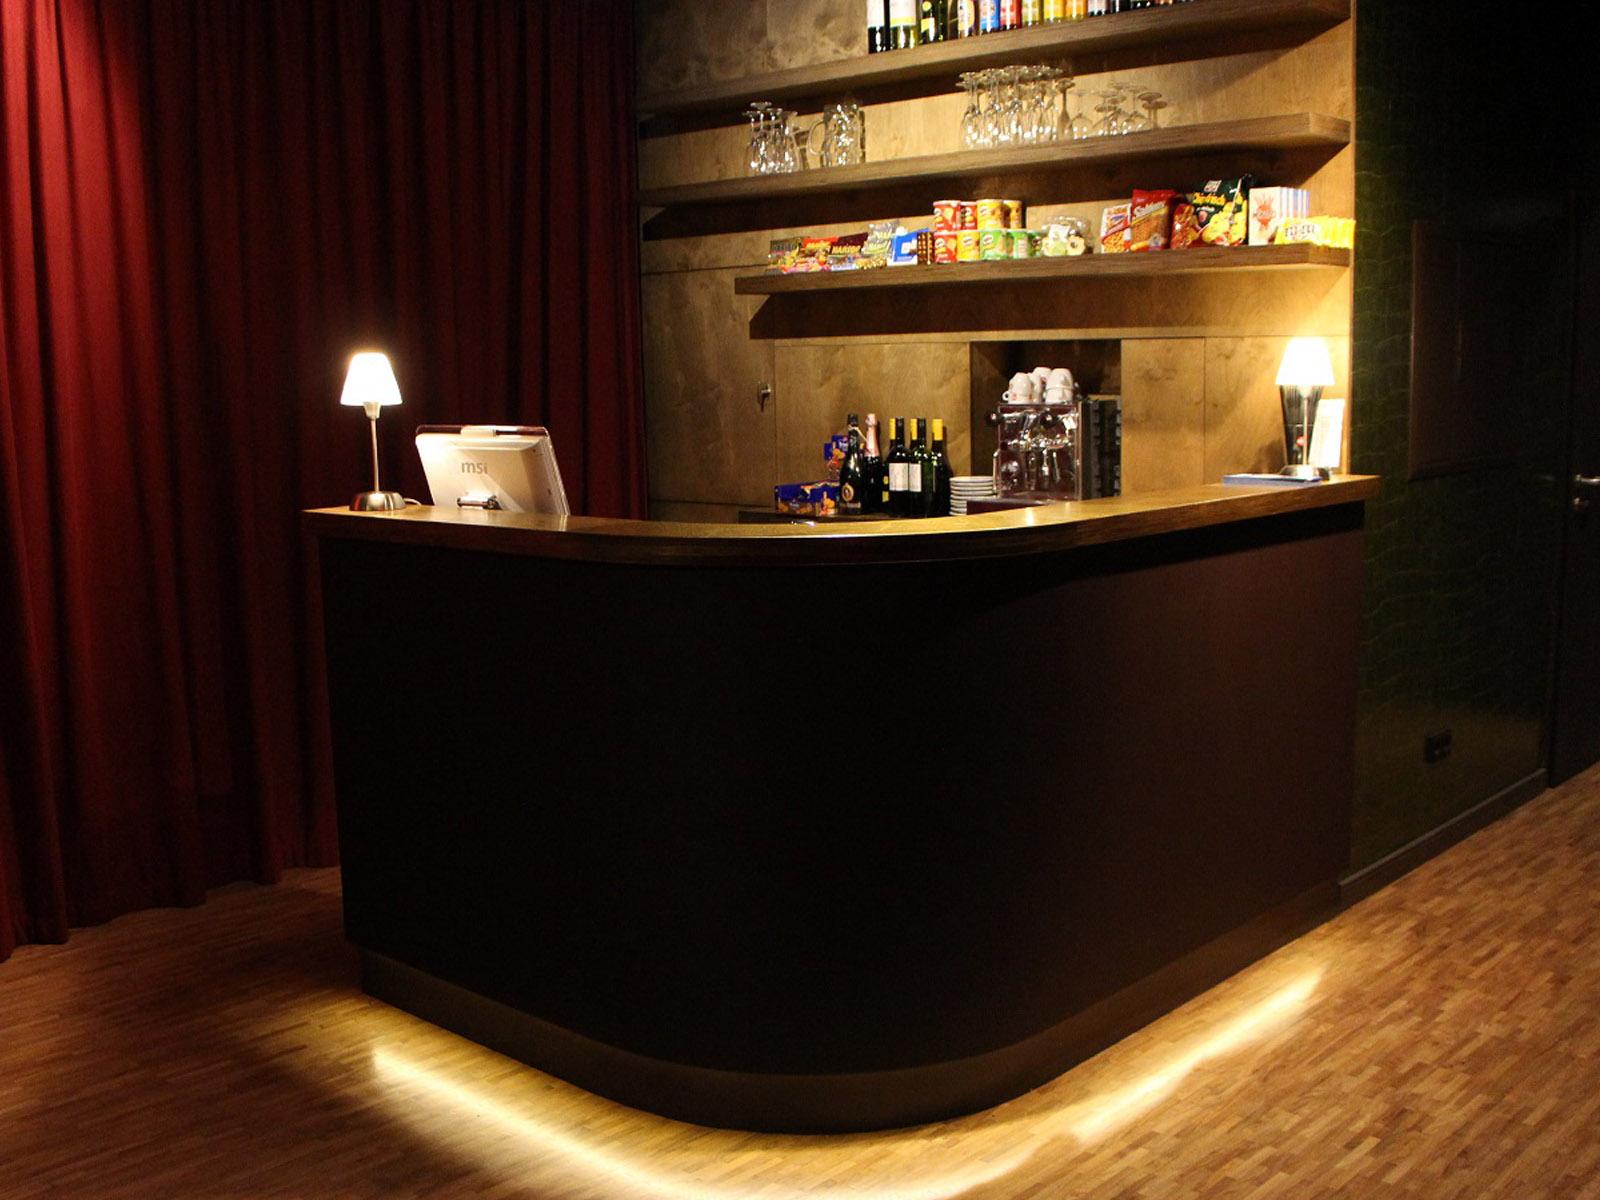 Aufnahme der Bar im Kino